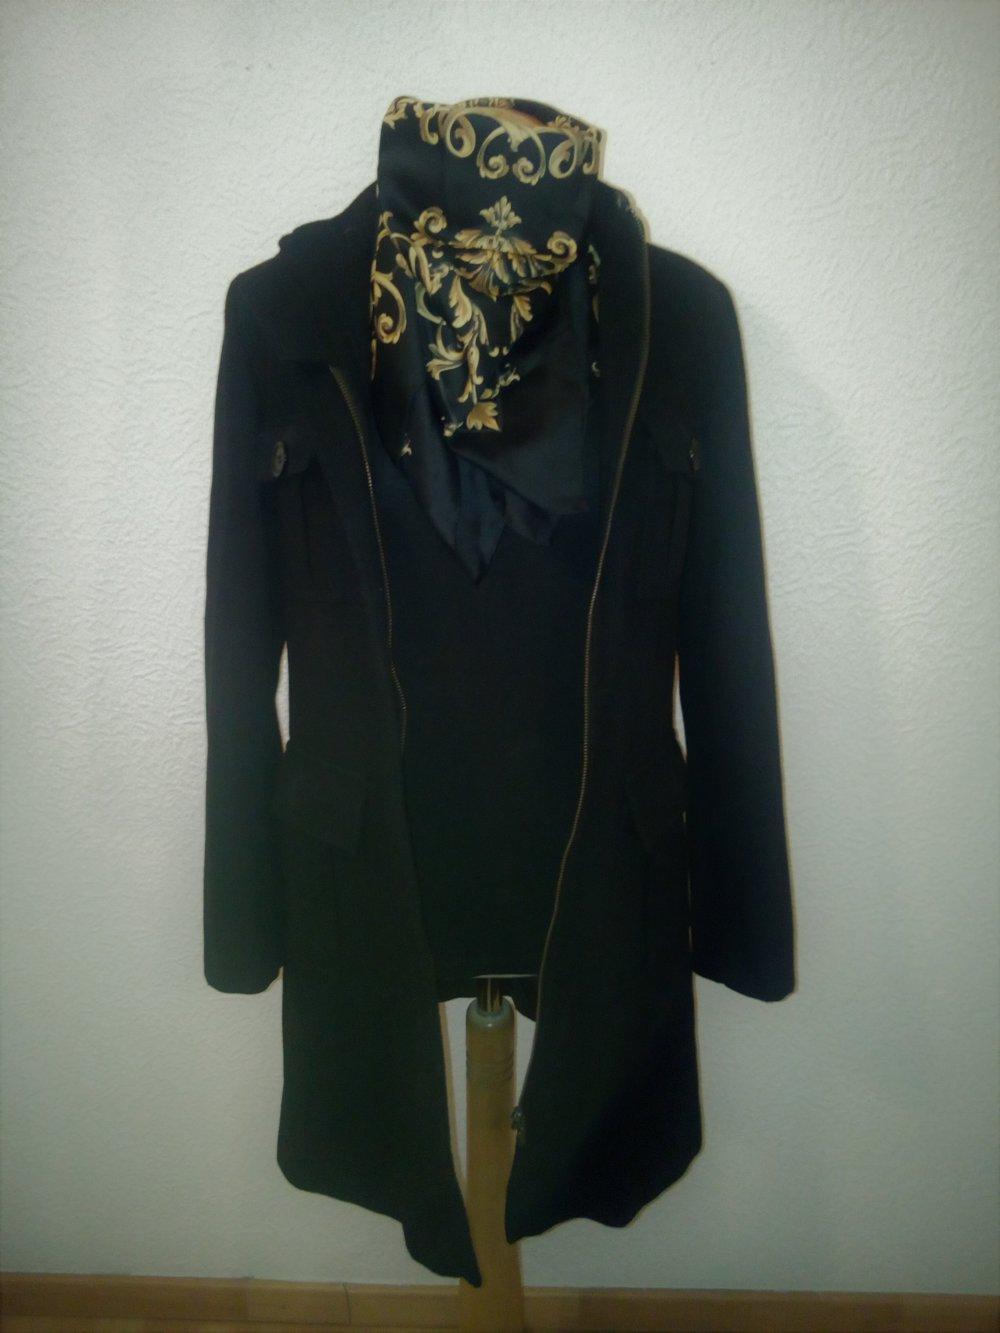 review schwarzer mantel wintermantel wolle schwarz black feminin. Black Bedroom Furniture Sets. Home Design Ideas